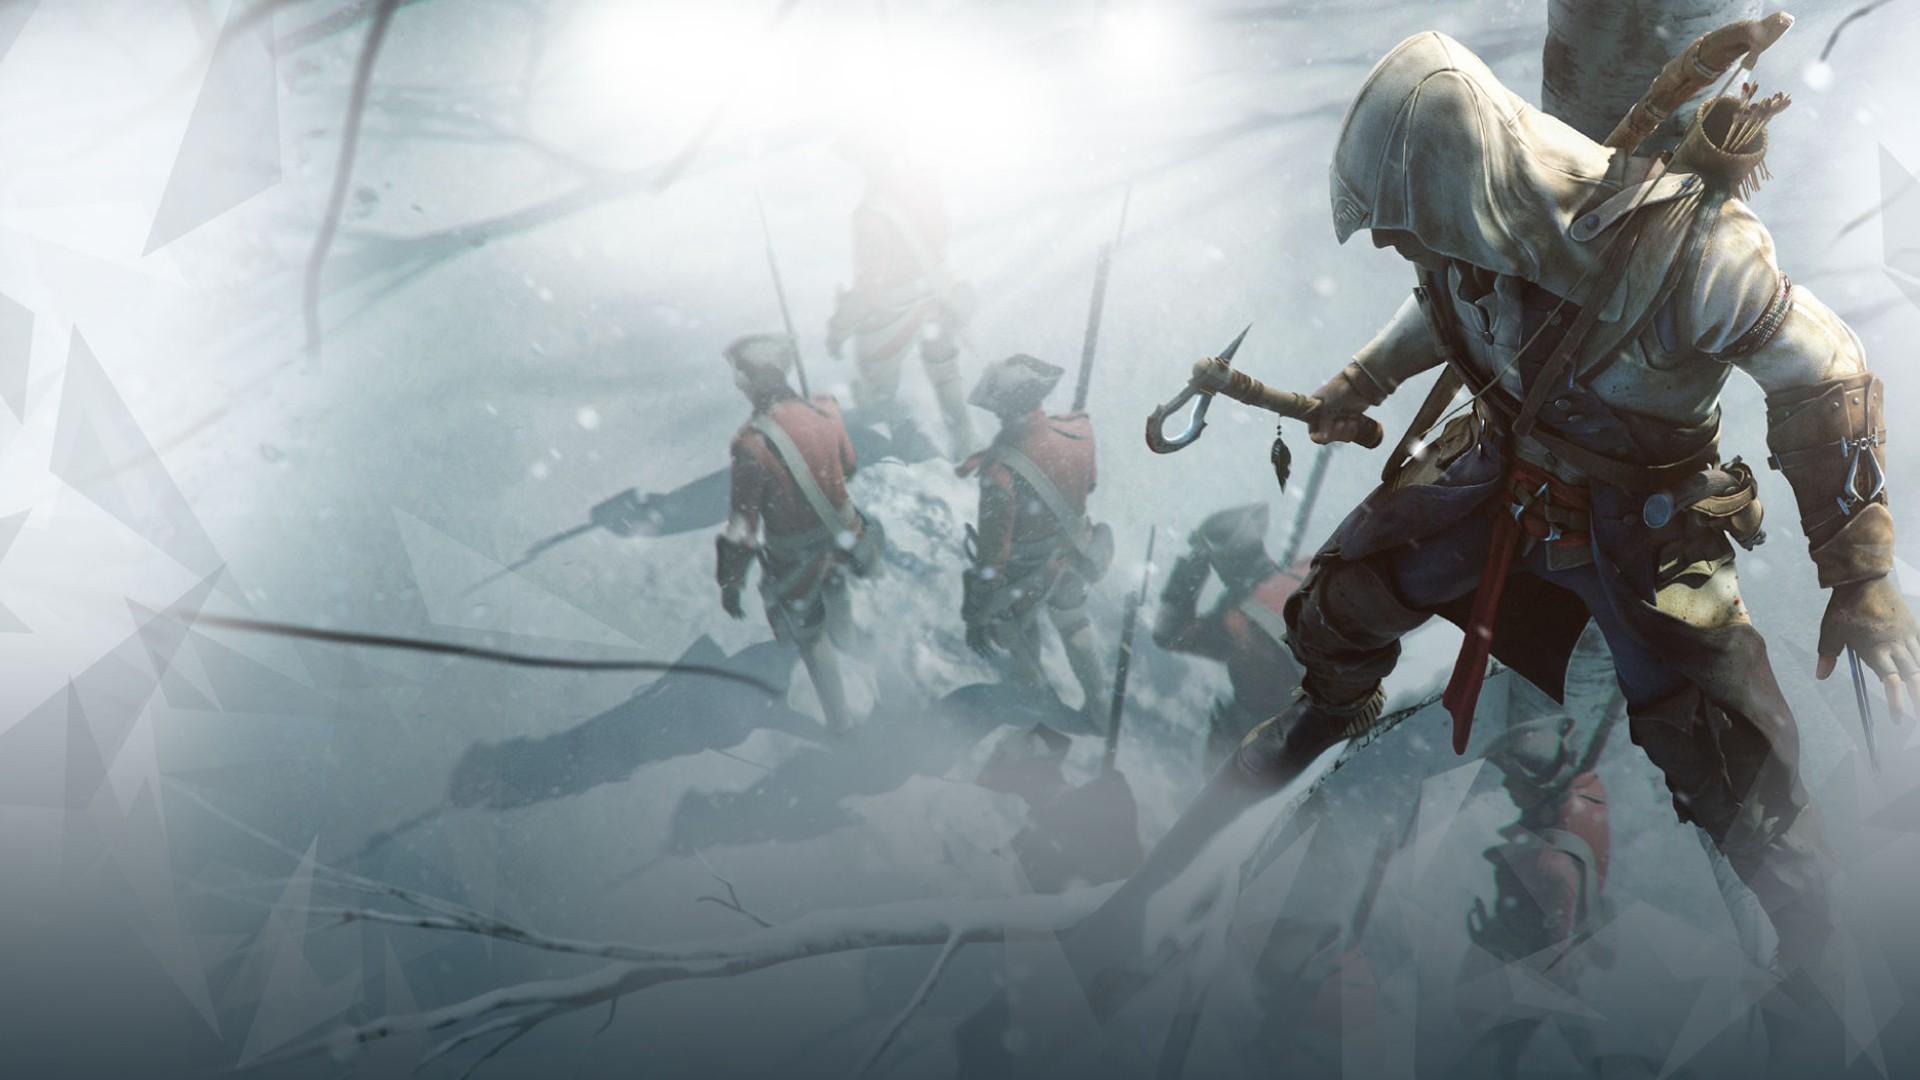 Assassin's Creed 3 HD Wallpaper